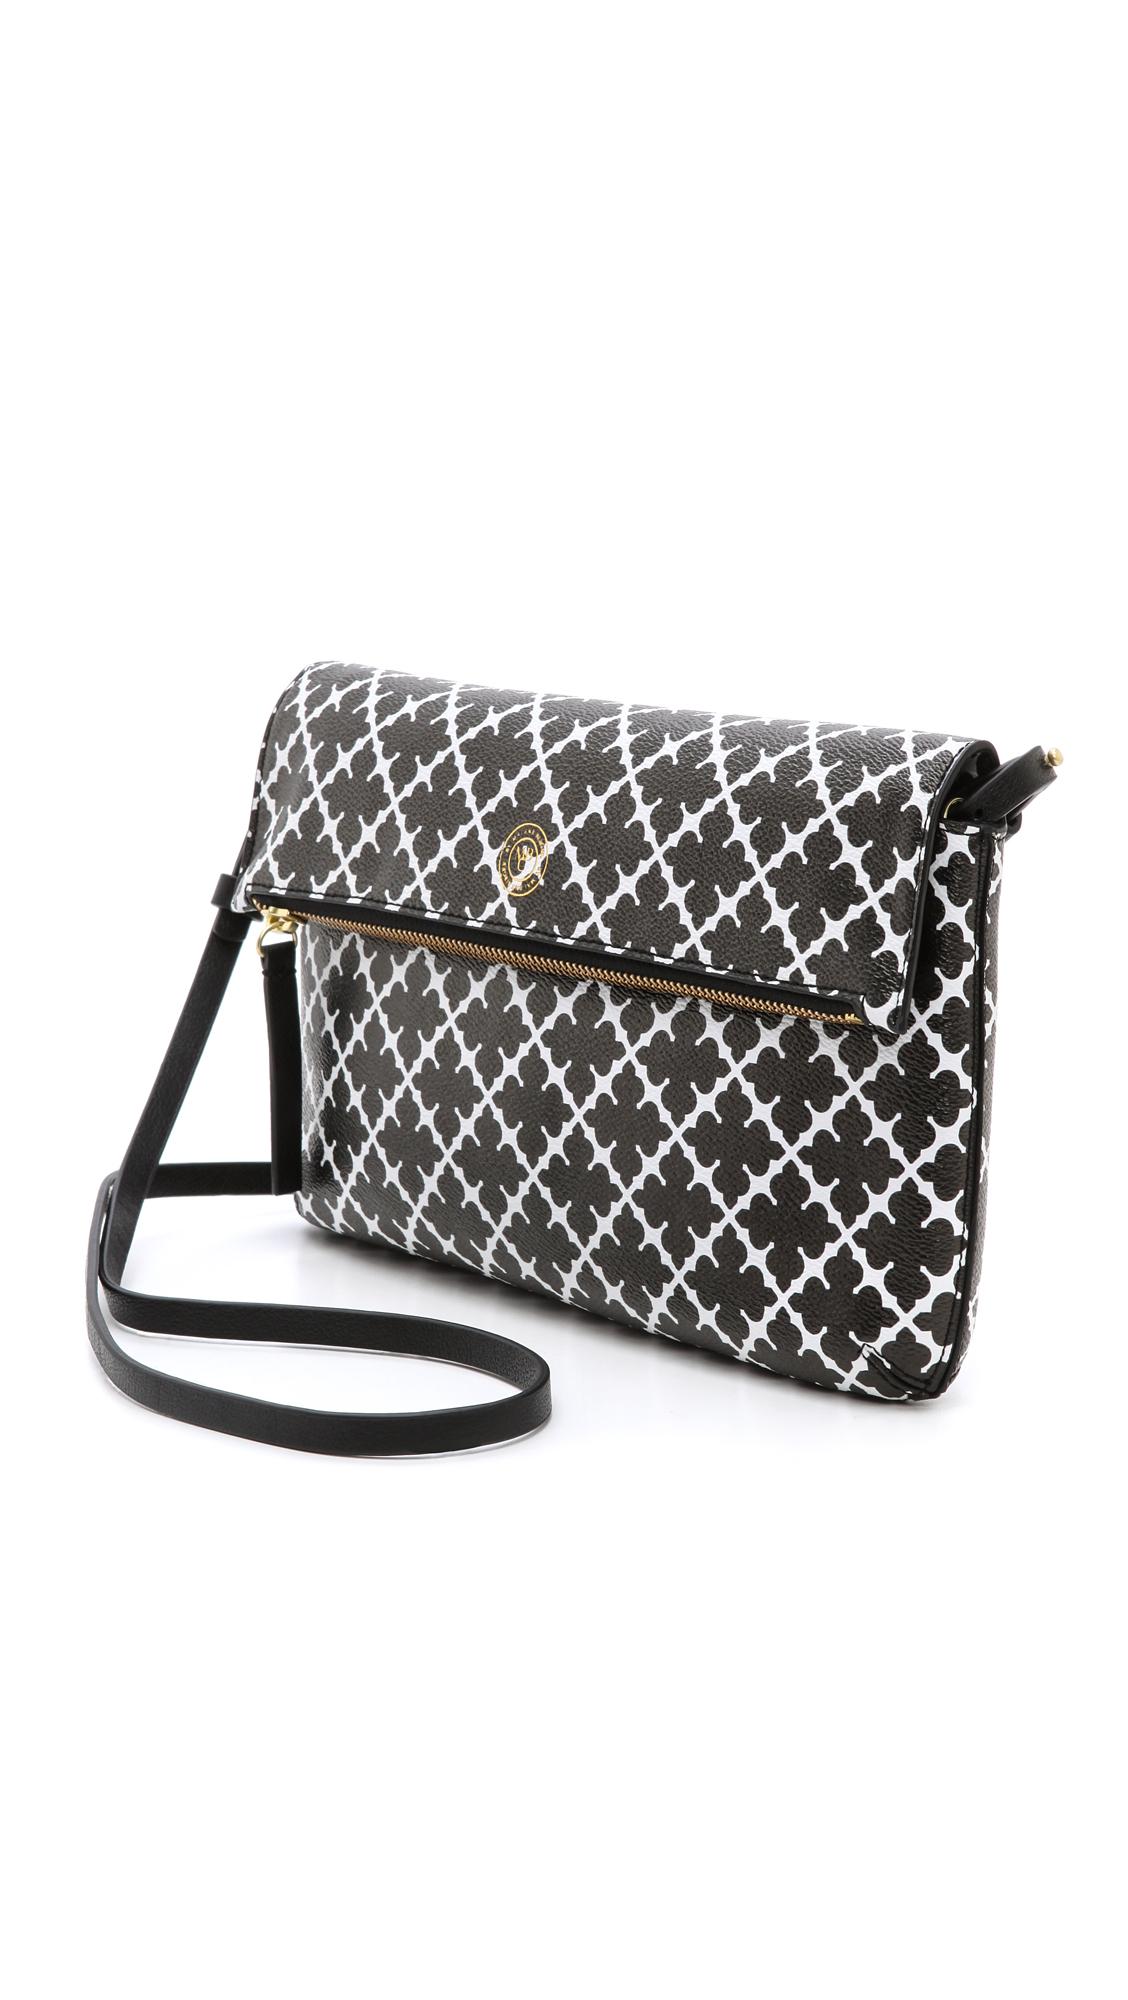 HANDBAGS - Handbags By Malene Birger Cheap Choice From China Cheap Sale Affordable CiQG9bs